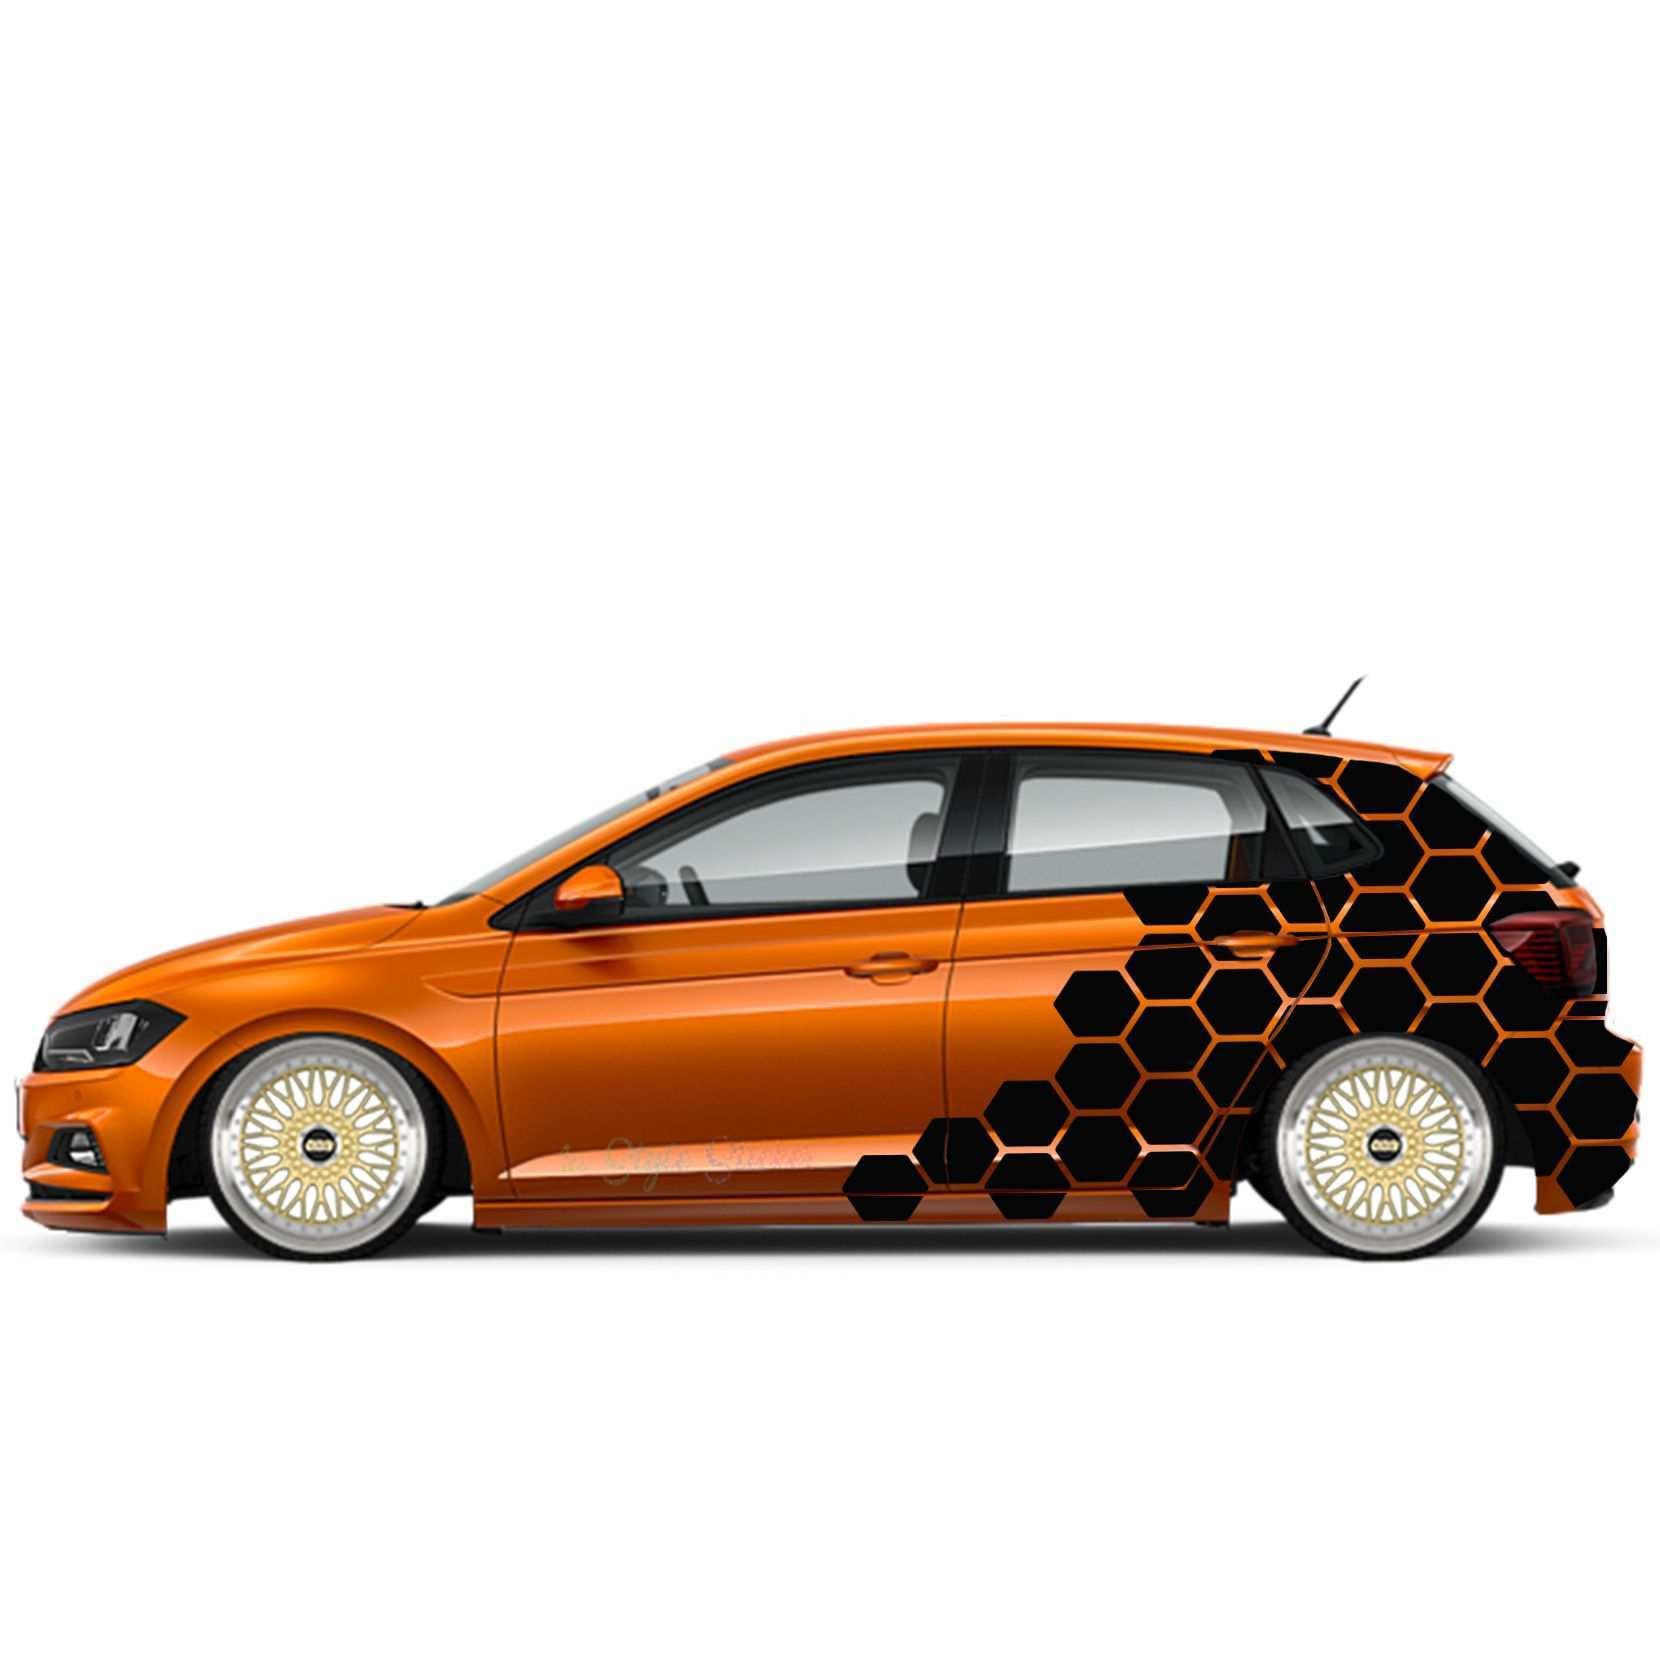 Auto Seiten Aufkleber Hexagon Waben Set 84 Teilig 2 Farbig Aufkleberset 6 Ebay Auto Aufkleber Kfz Folierung Autos